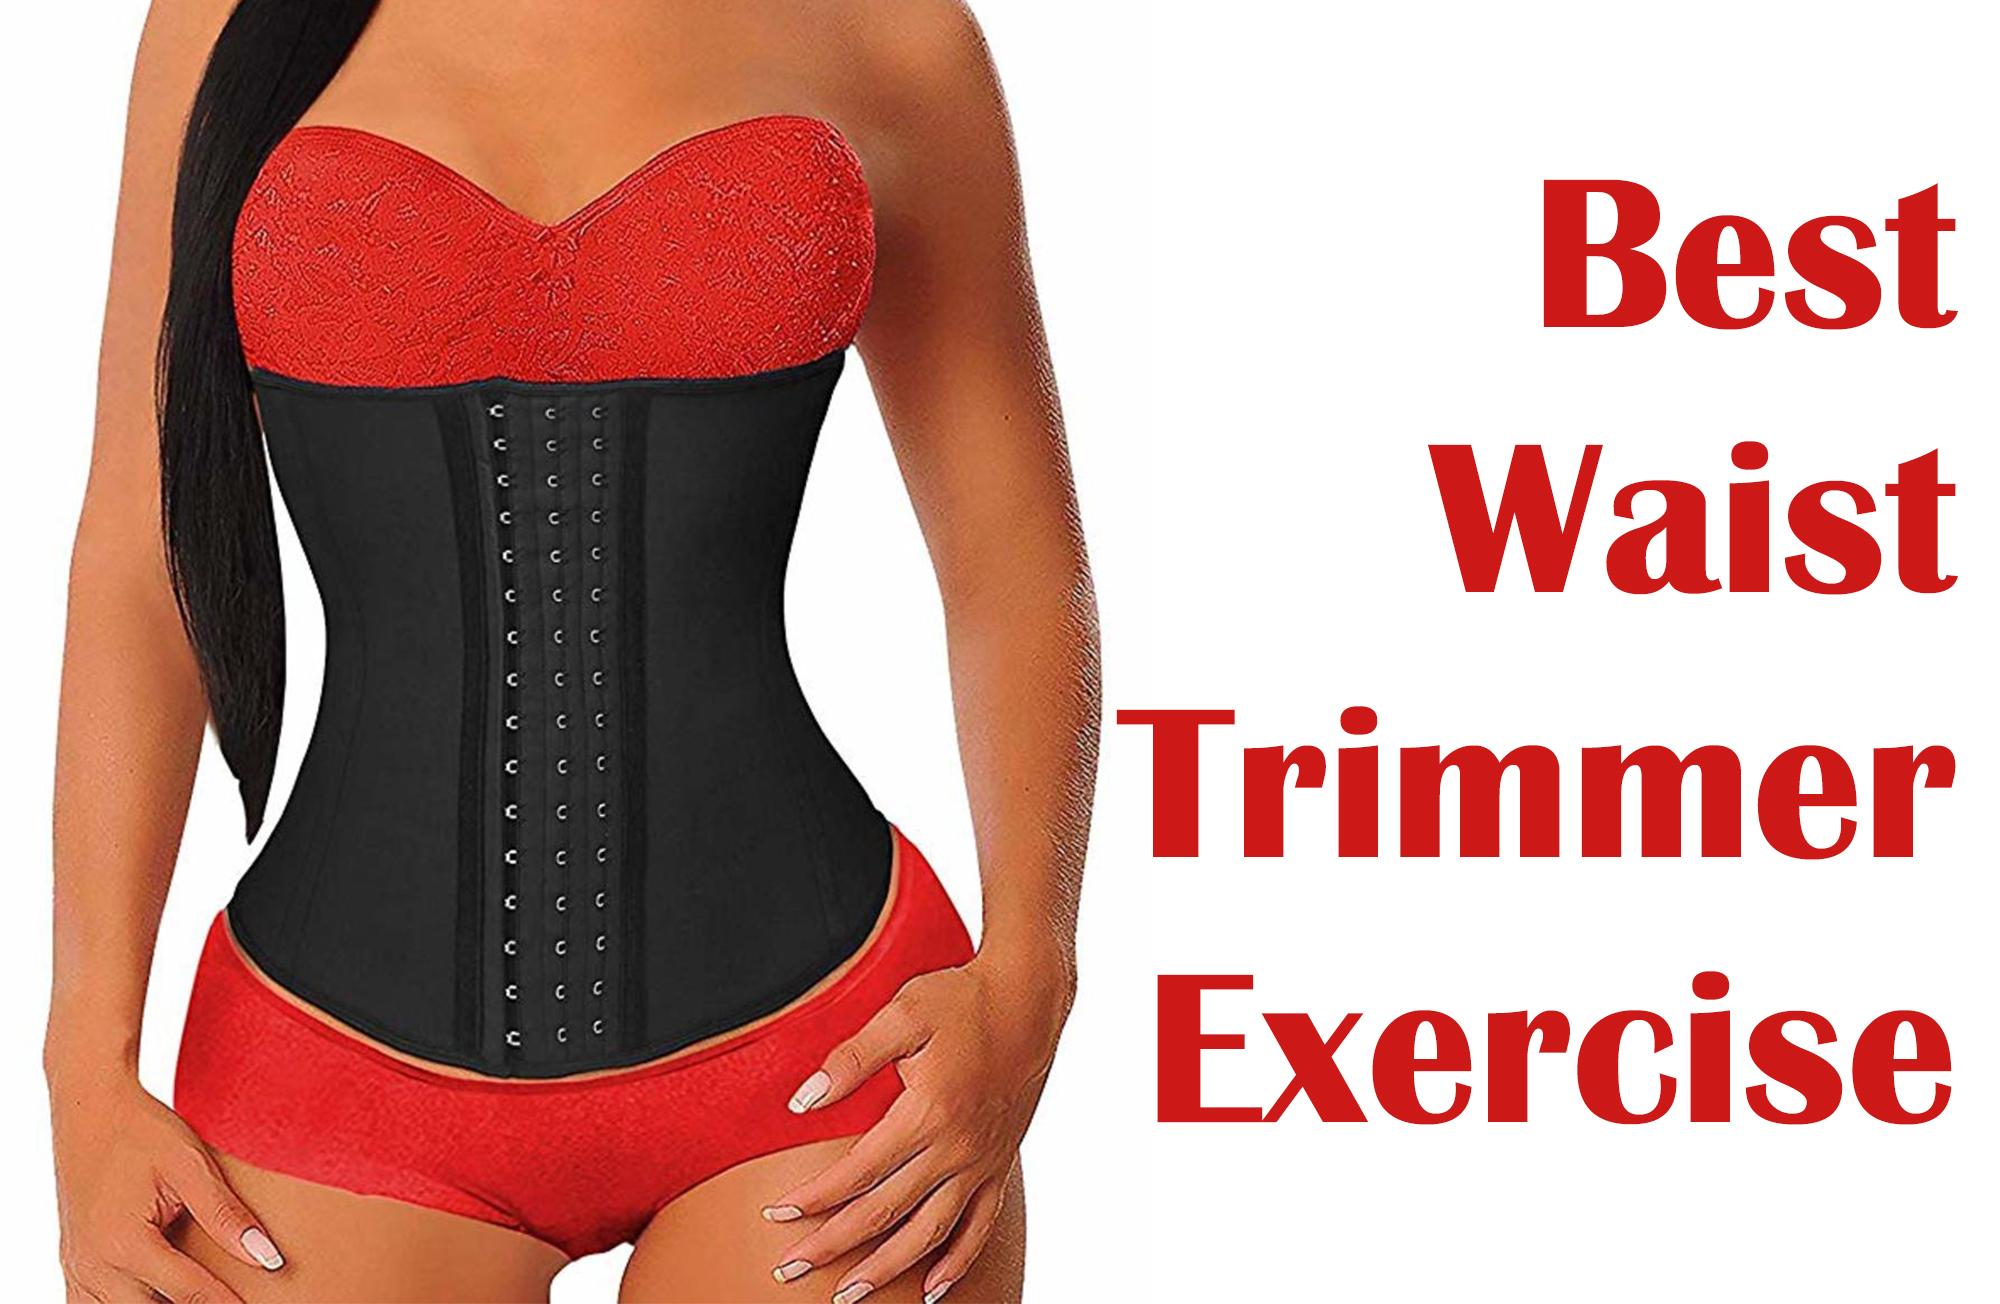 Best waist trimmer exercise